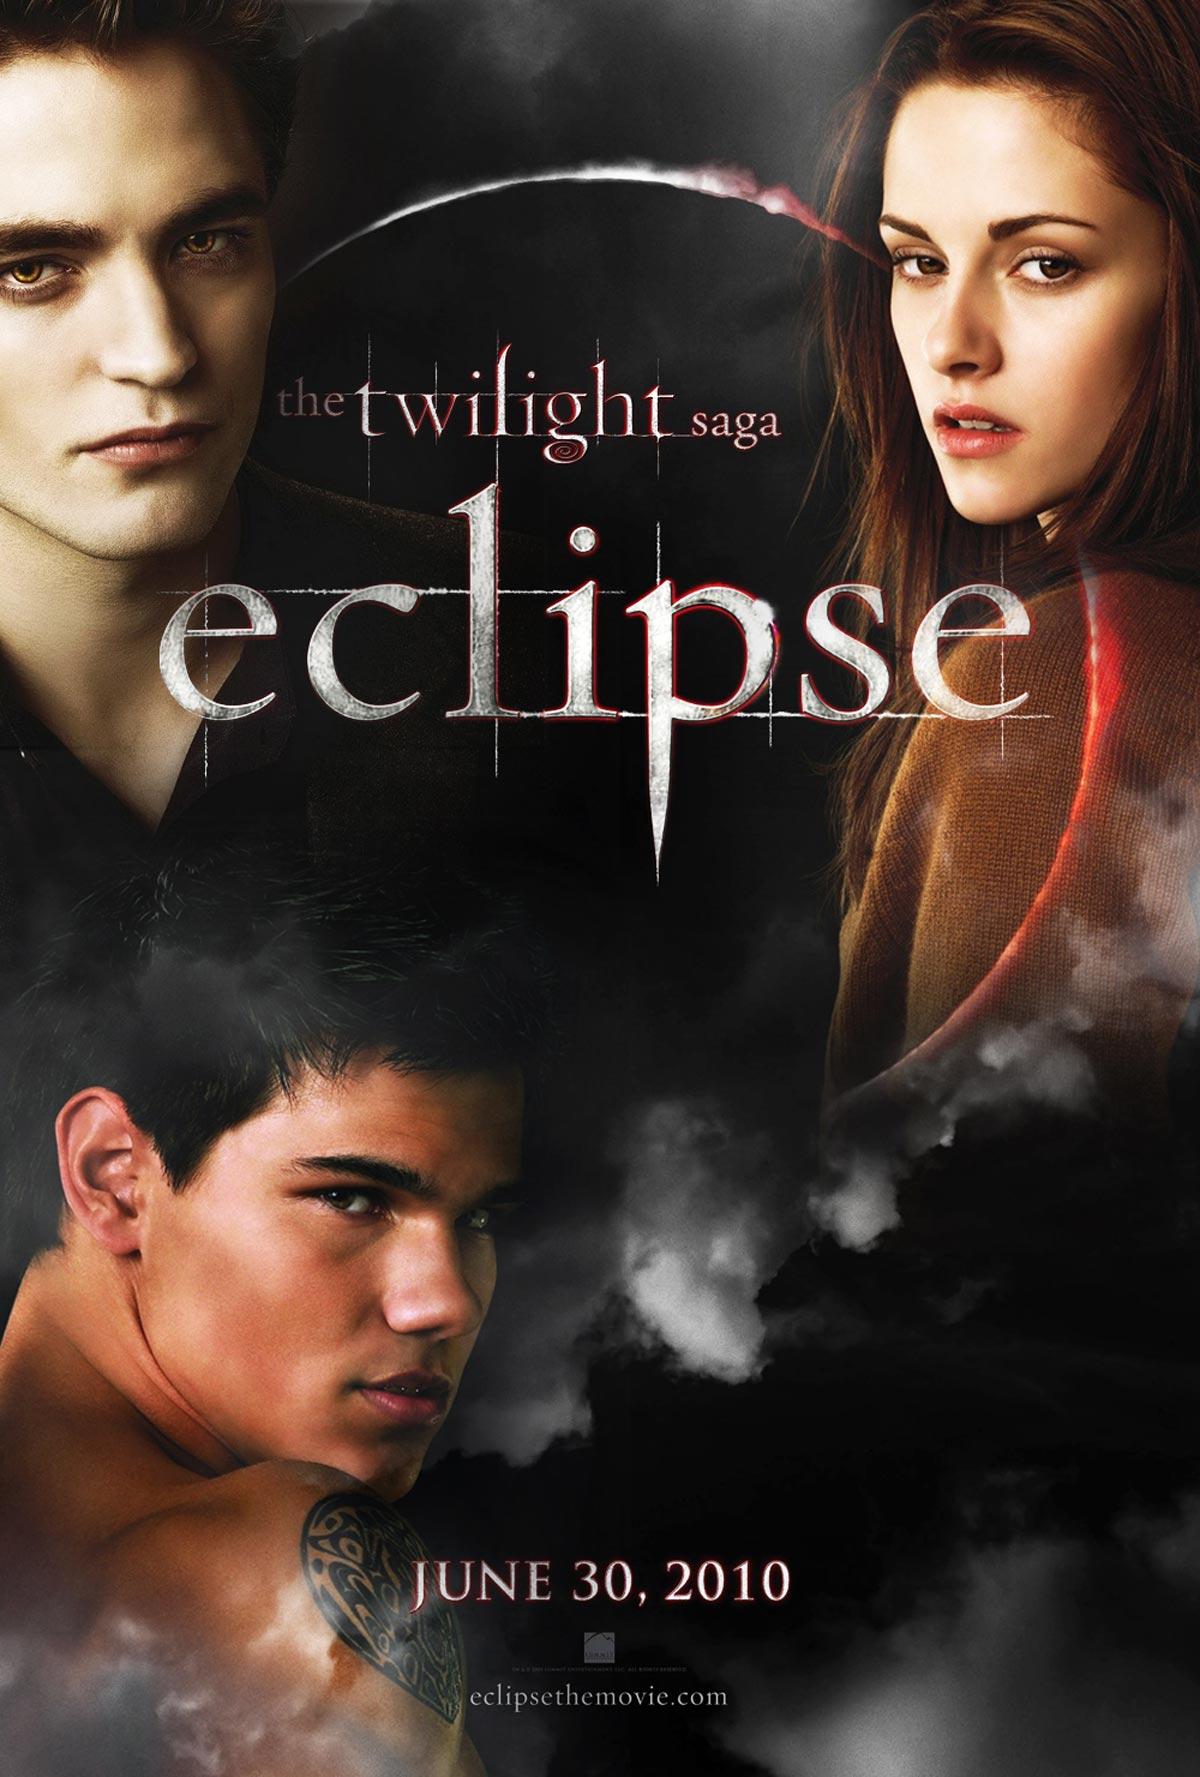 The Twilight Saga: Eclipse (2010) poster